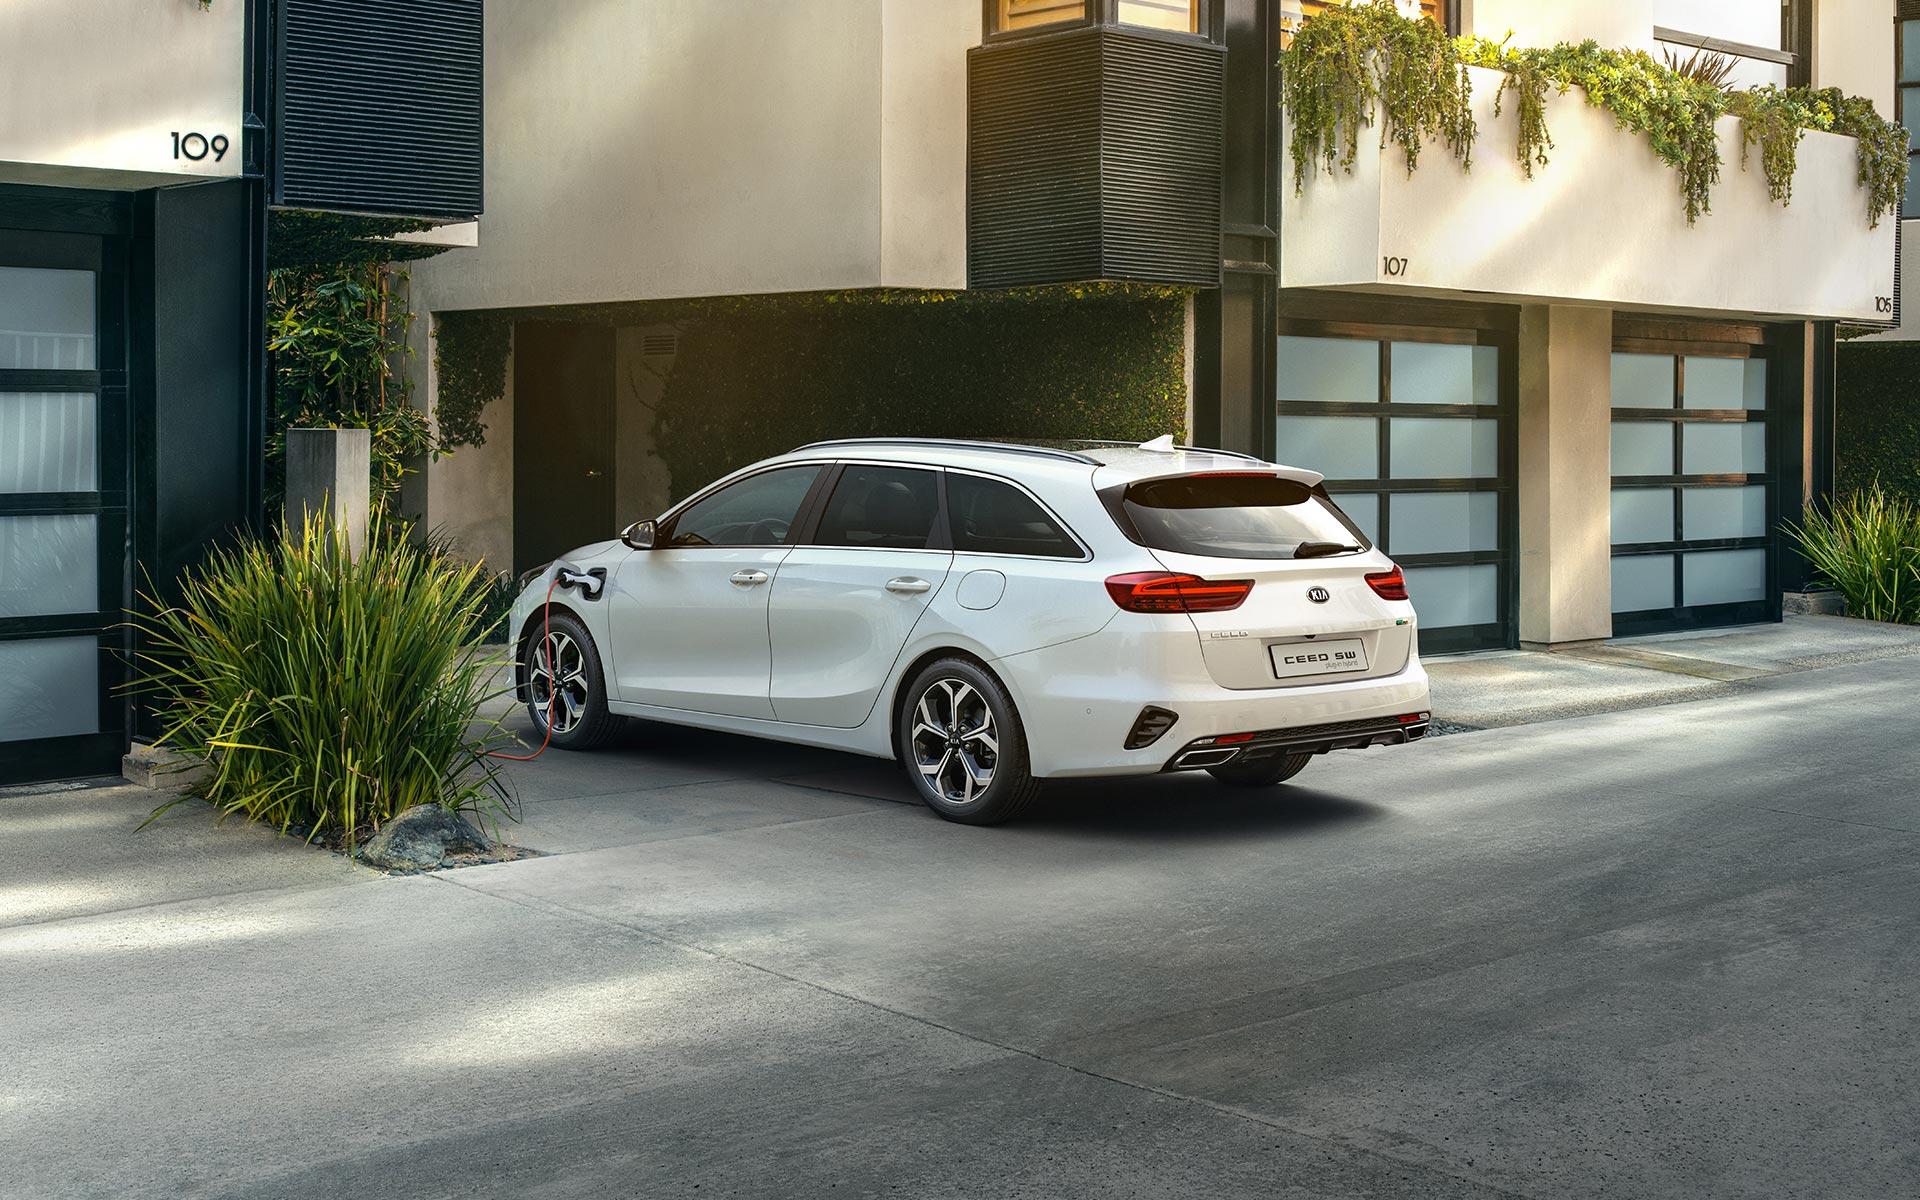 [Kaufdeal] KIA ceed SW Plug-in-Hybrid Neuwagen LP 34.108€ - ohne BAFA Risiko